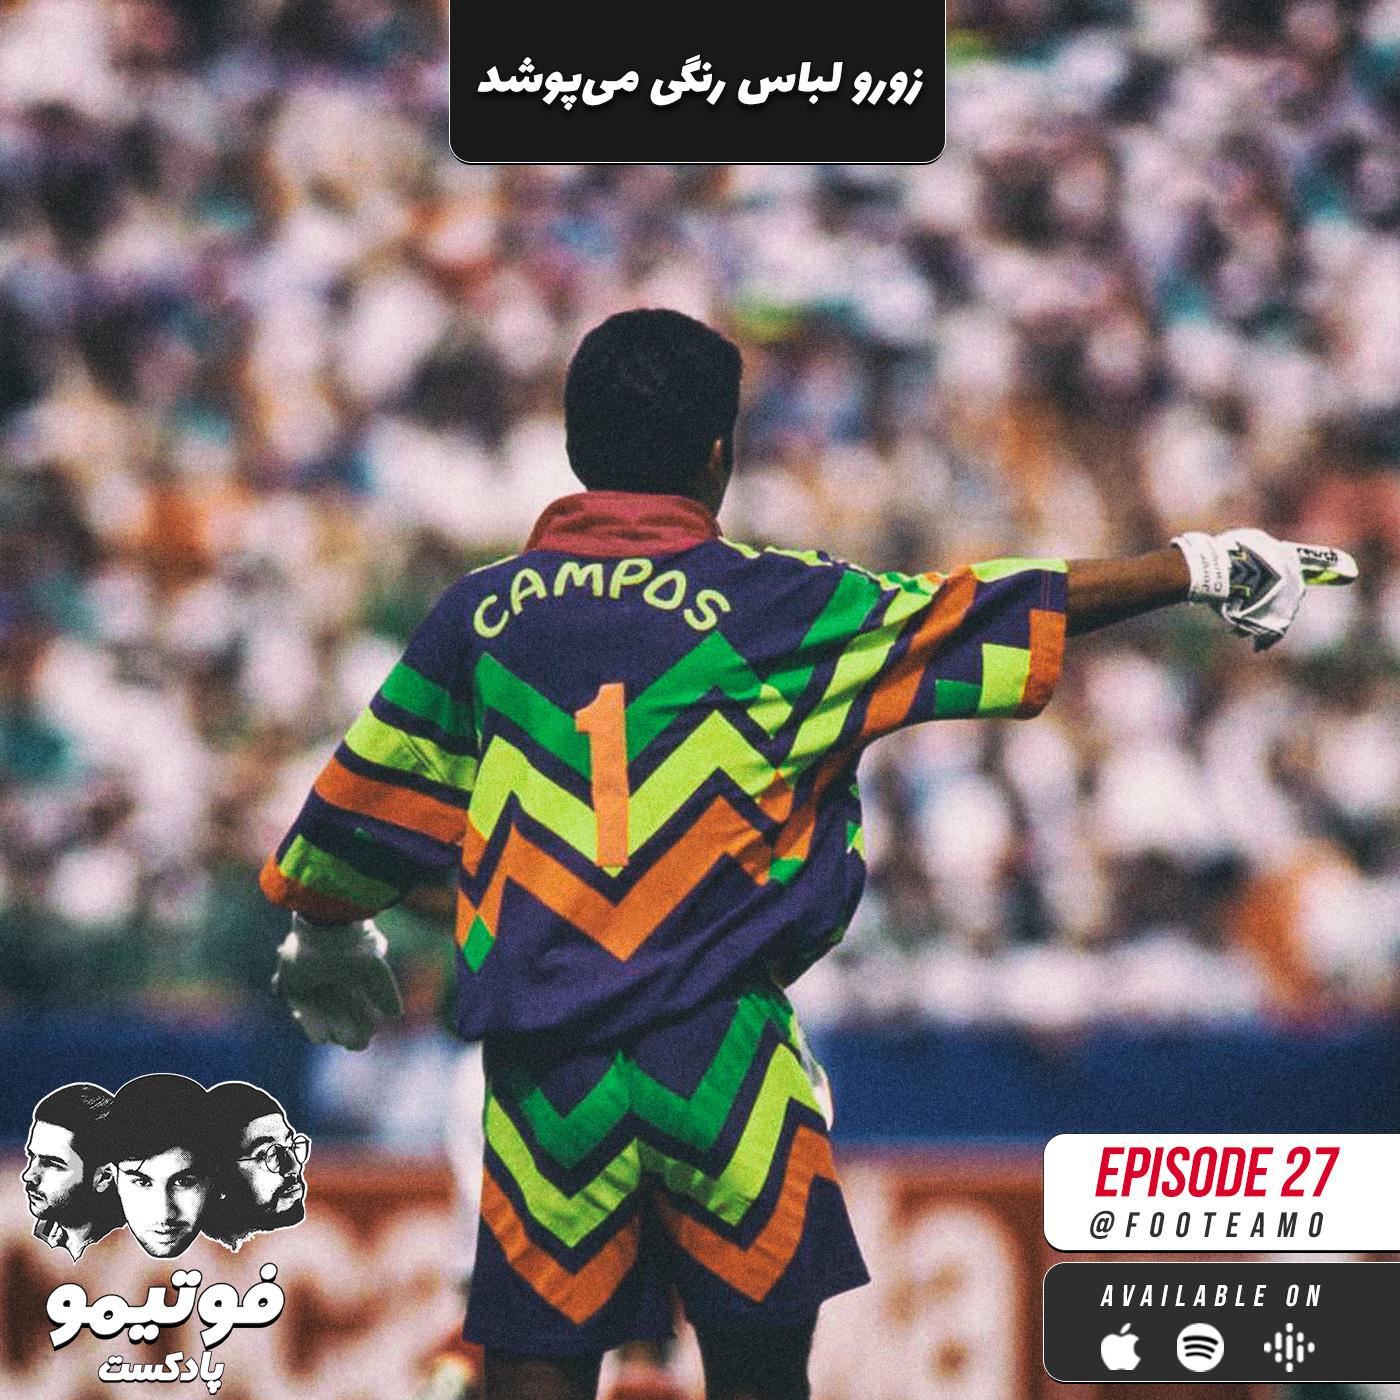 Poster Episode27 پادکست فوتبالی فوتیمو